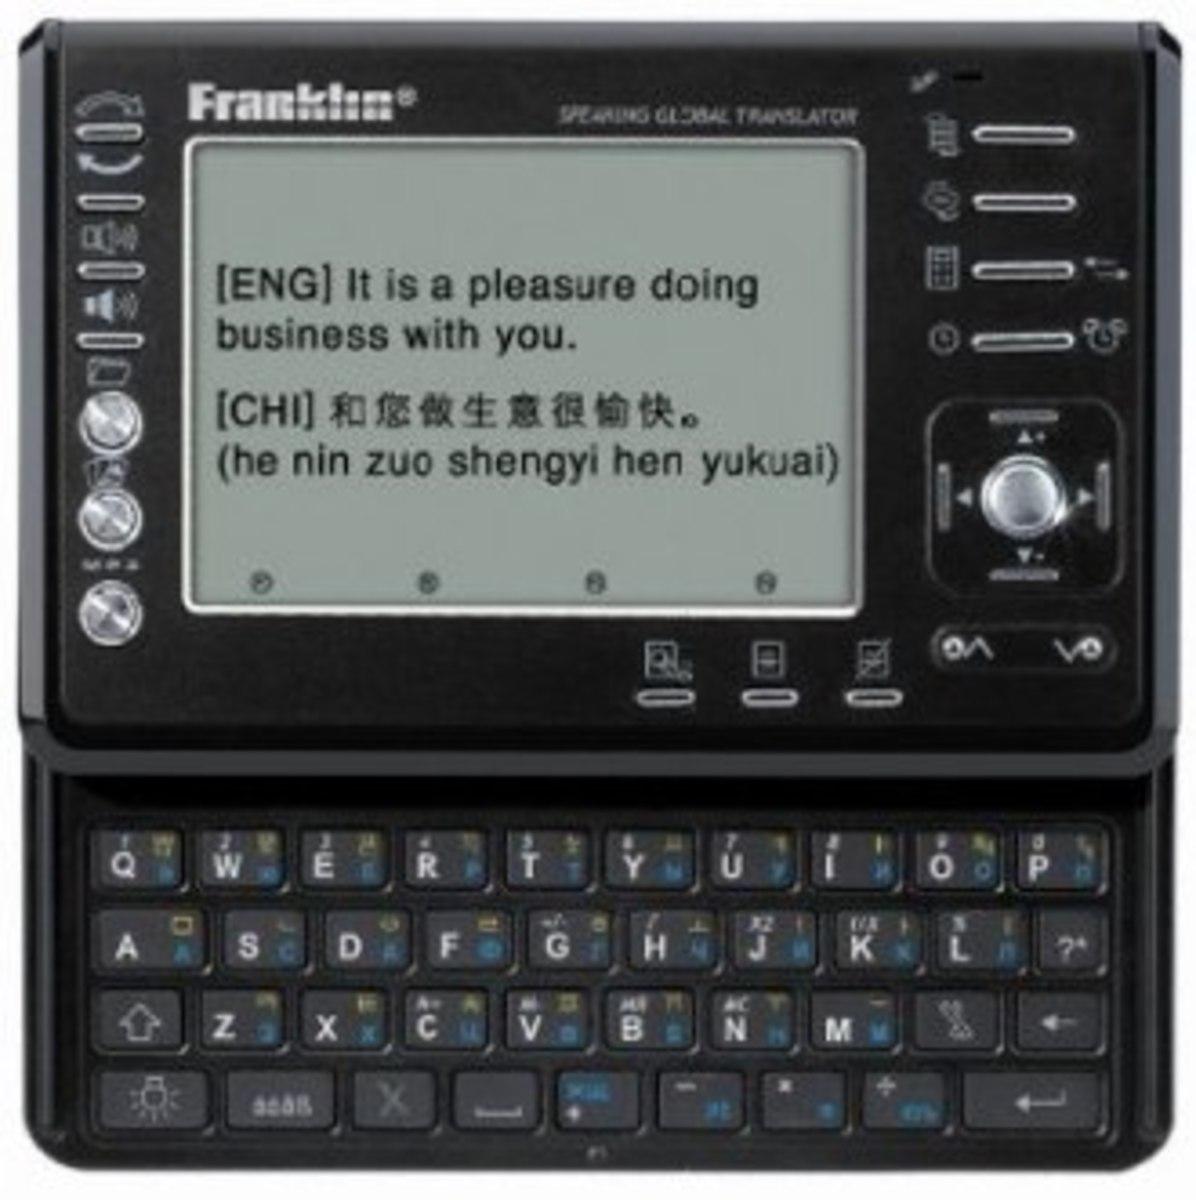 franklin12